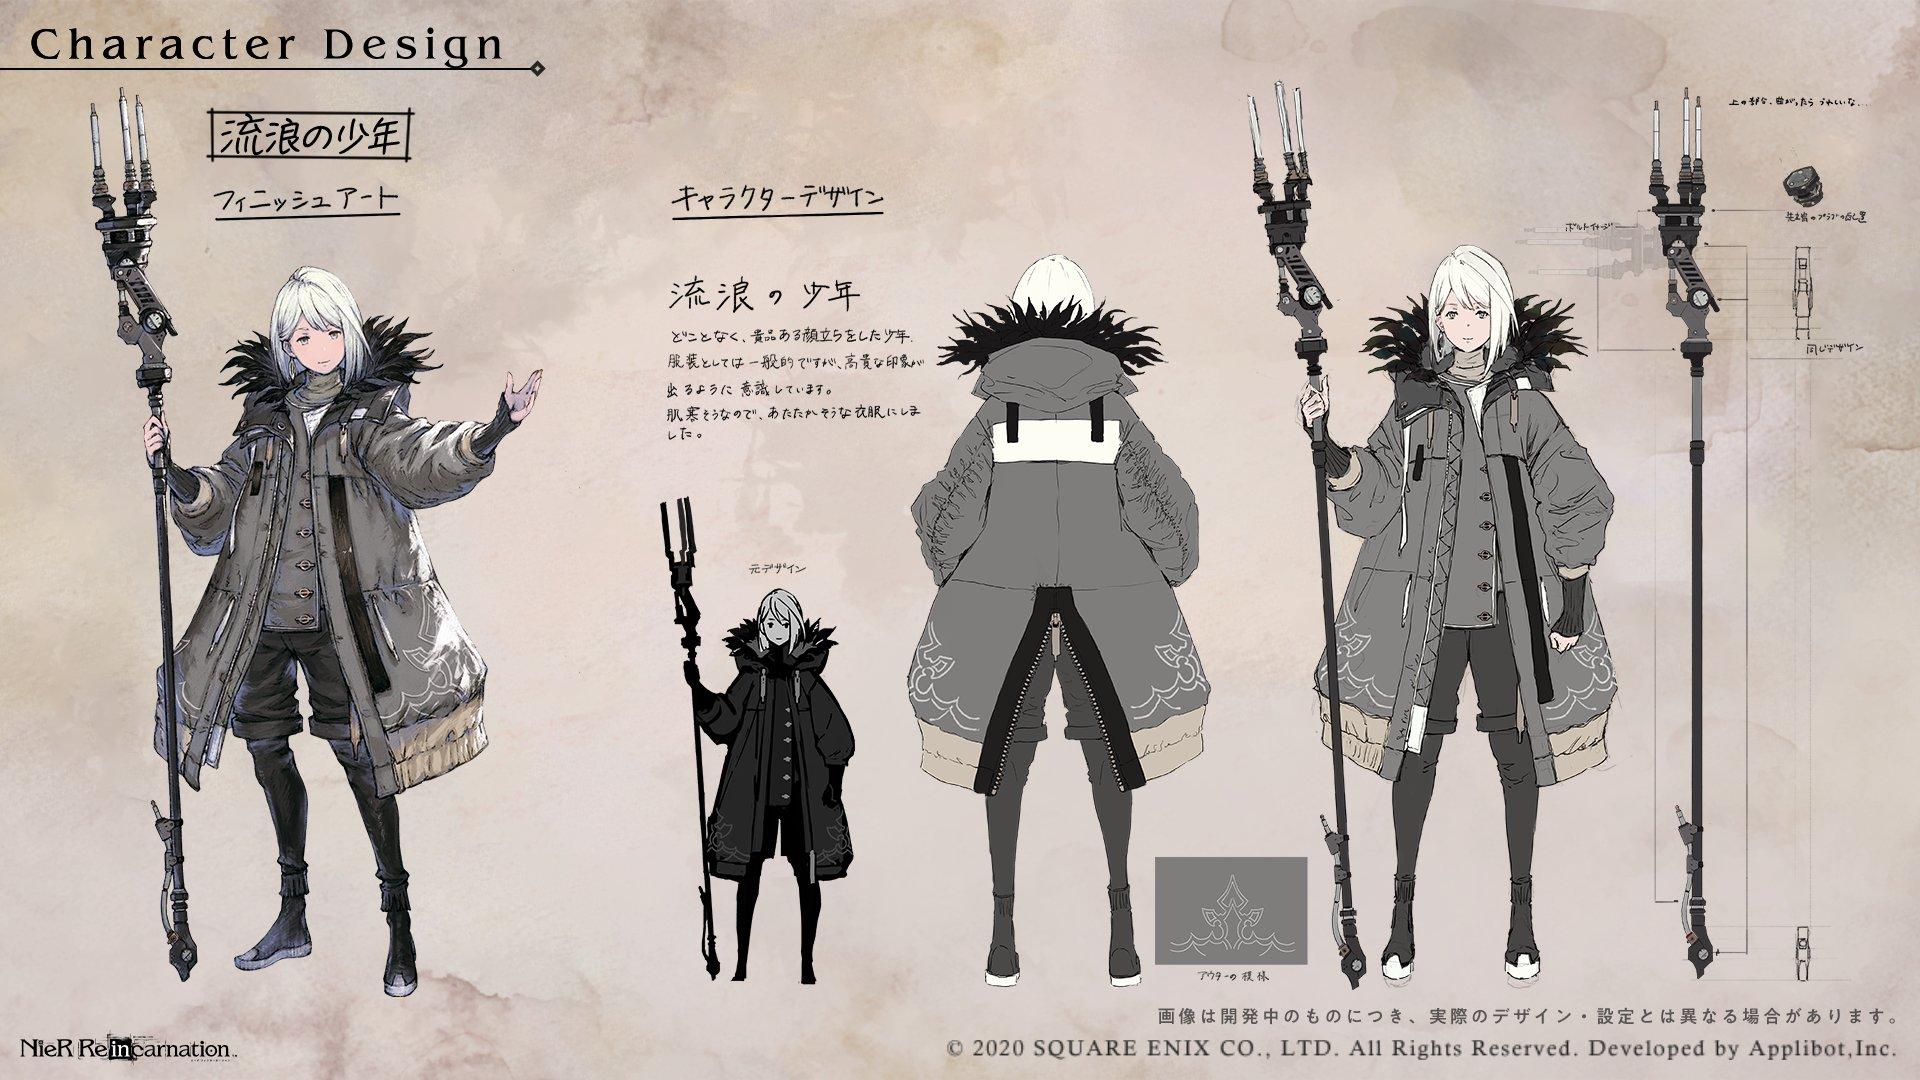 NieR Reincarnation Wandering Boy Concept Art